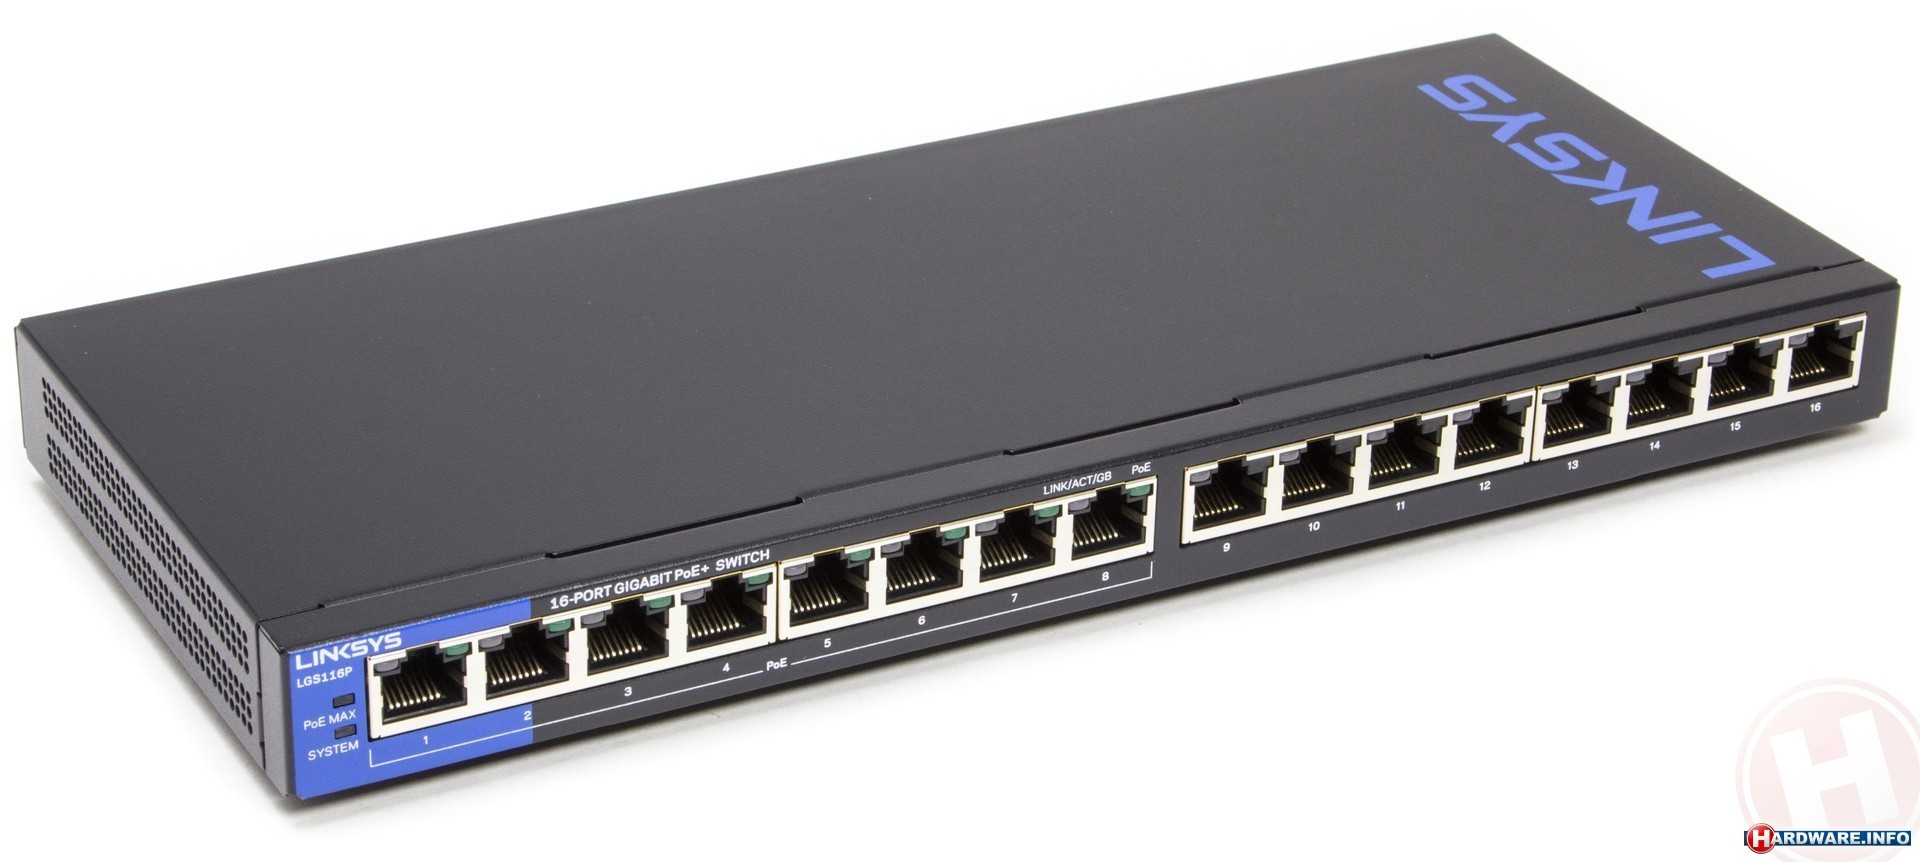 Switch Linksys LGS116P, 16-Port Desktop Business Gigabit PoE (LGS116P)